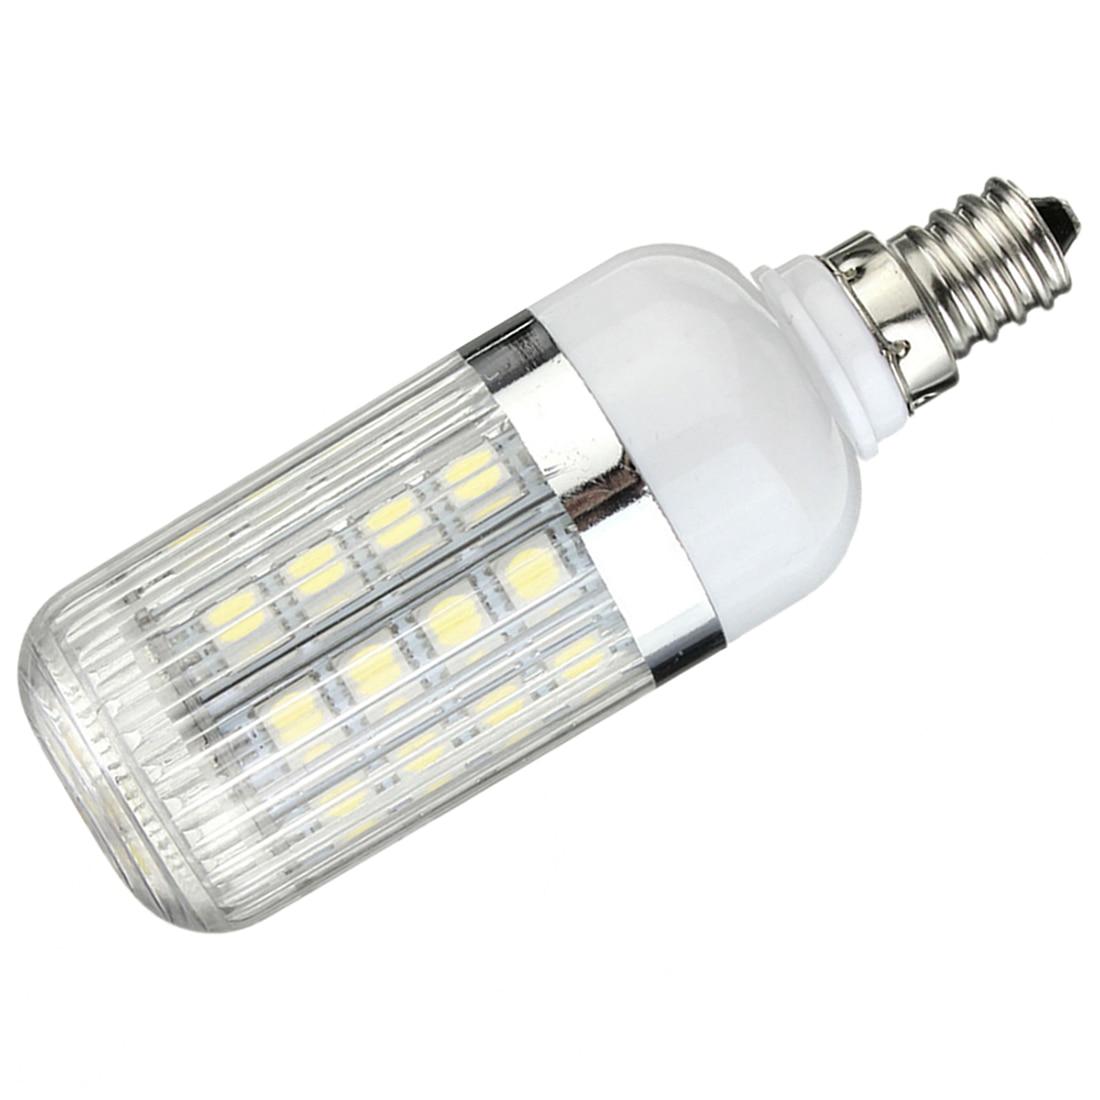 E12 5W Dimmable 36 SMD 5050 LED Corn Light Bulb Lamp Color Temperature:Pure White(6000-6500K) Amount:10 Pcs g9 5w dimmable 27 smd 5050 led corn light bulb lamp color temperature pure white 6000 6500k amount 8 pcs